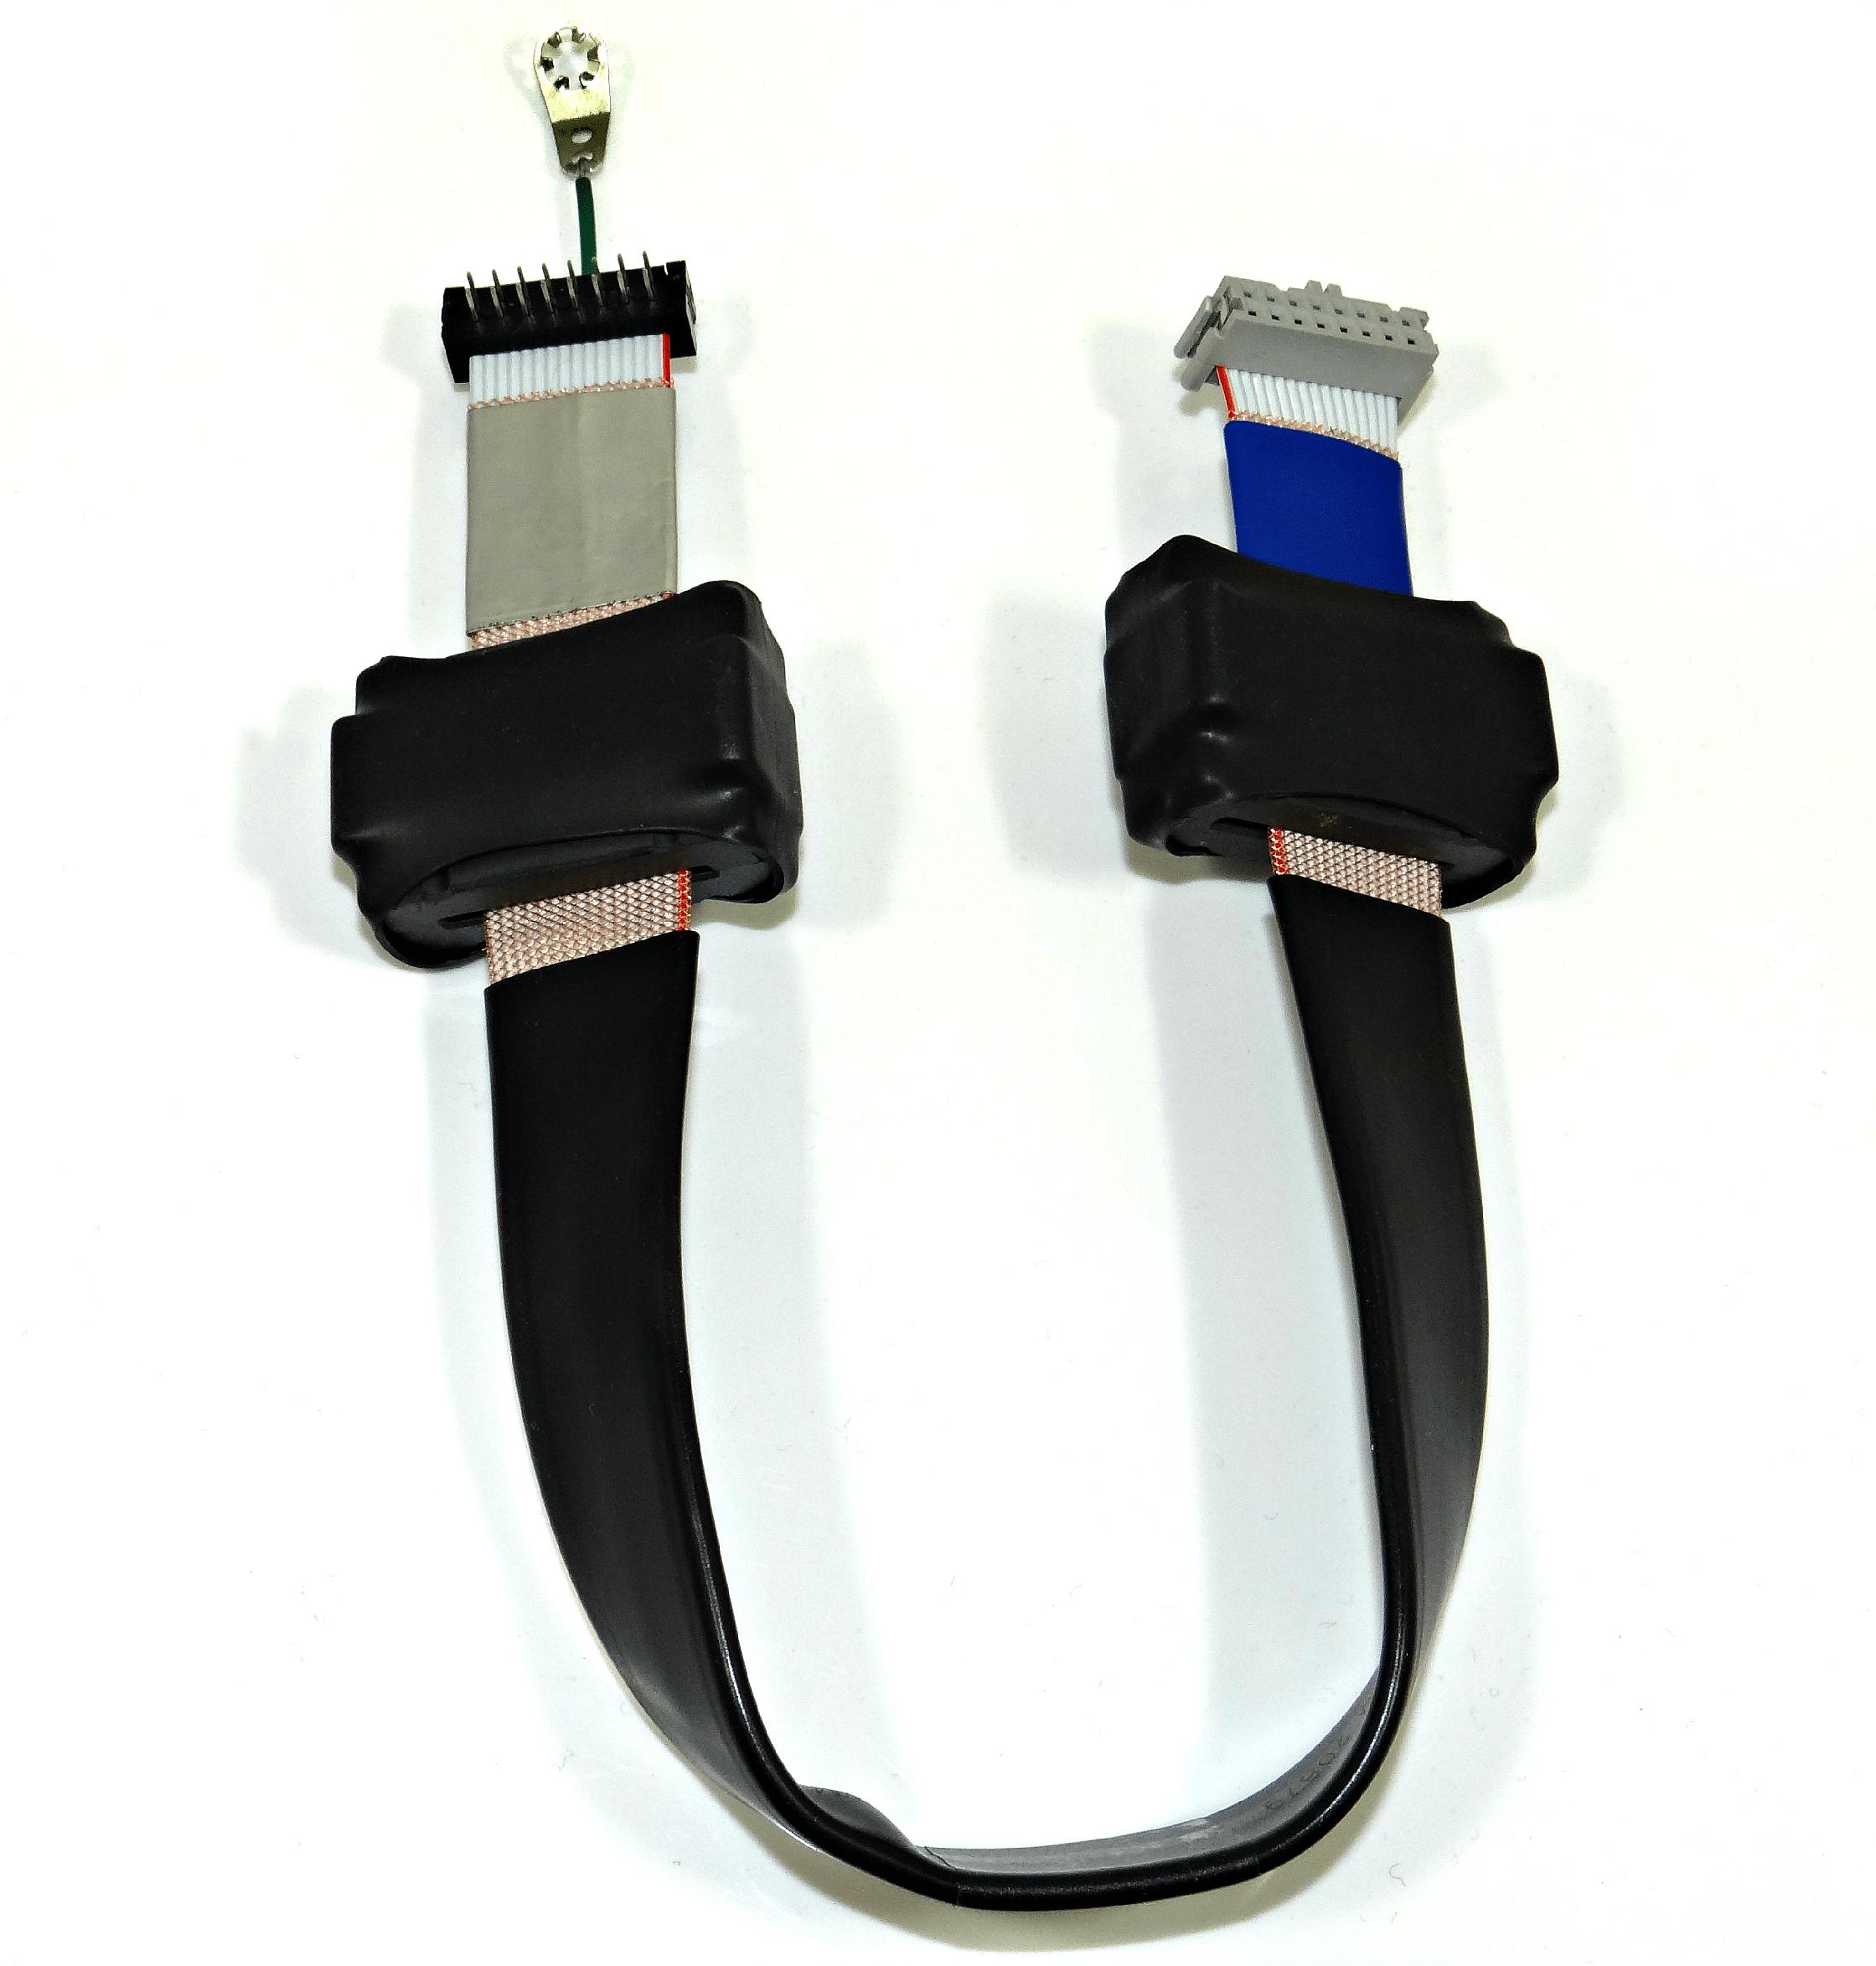 Ribbon Cables Cable Assembly : Ribbon cable assemblies cdm electronics